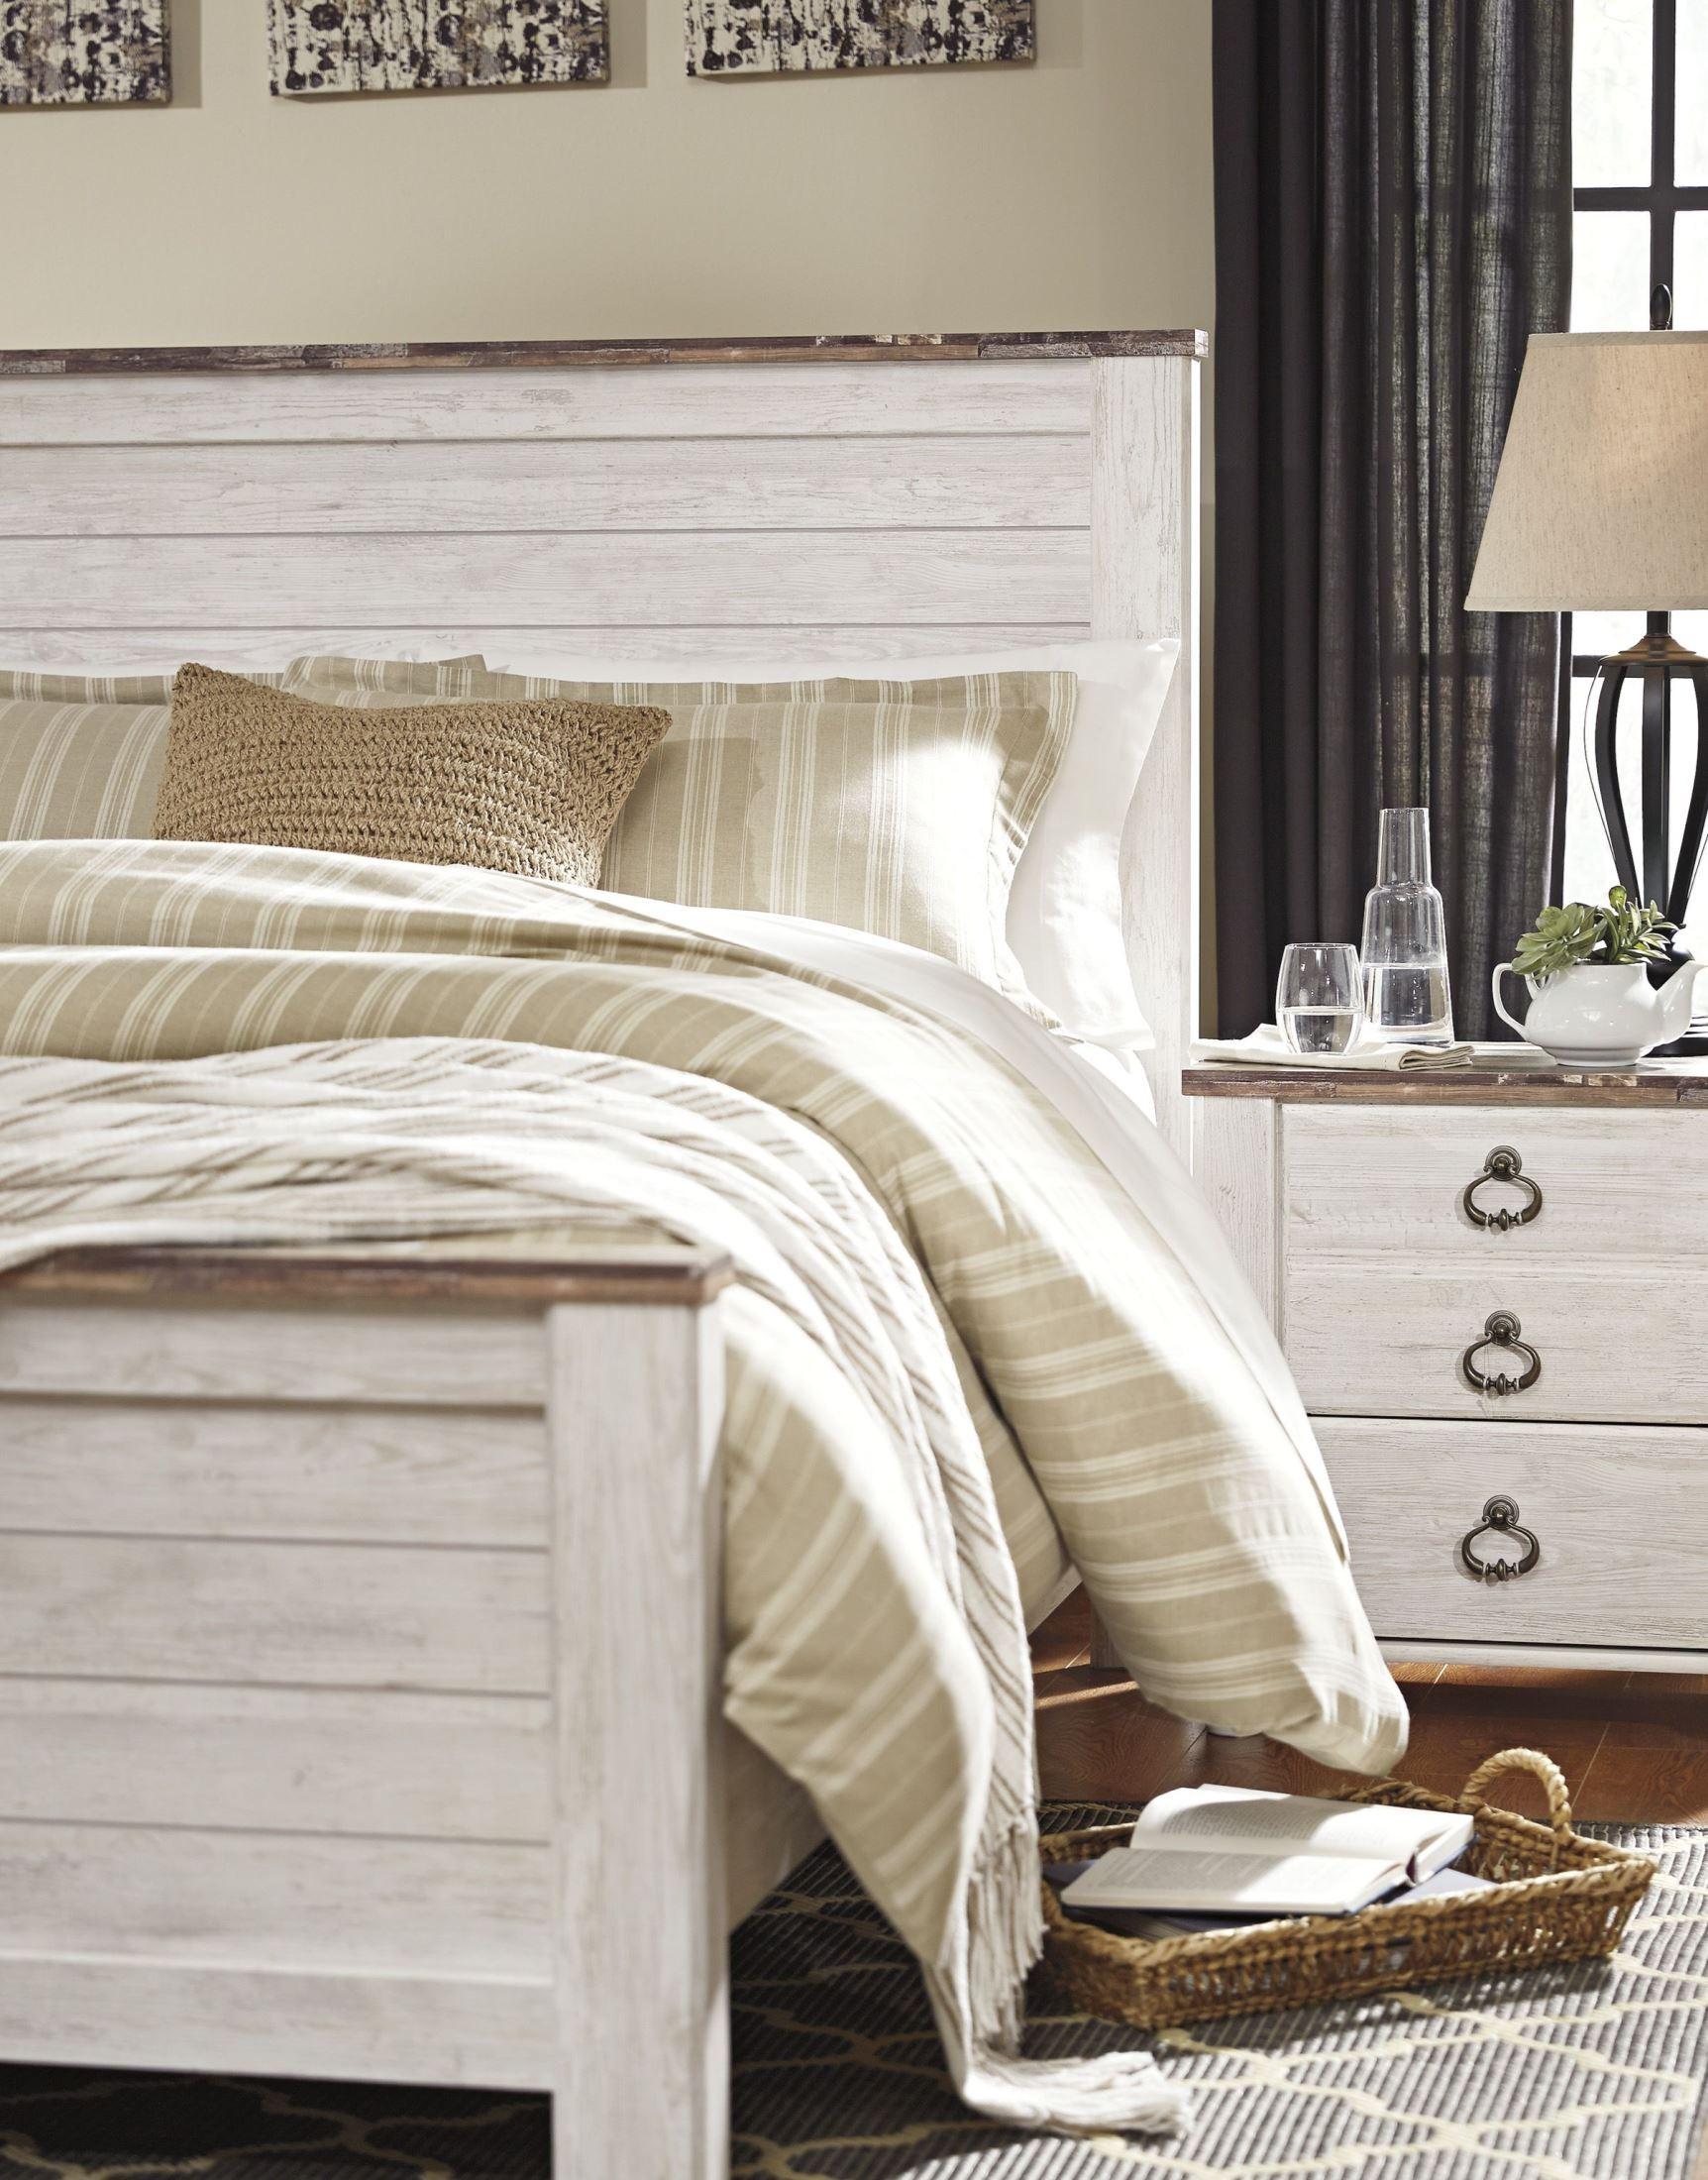 marvellous whitewash furniture bedroom set | Willowton Whitewash Panel Bedroom Set, B267-54-57-98, Ashley